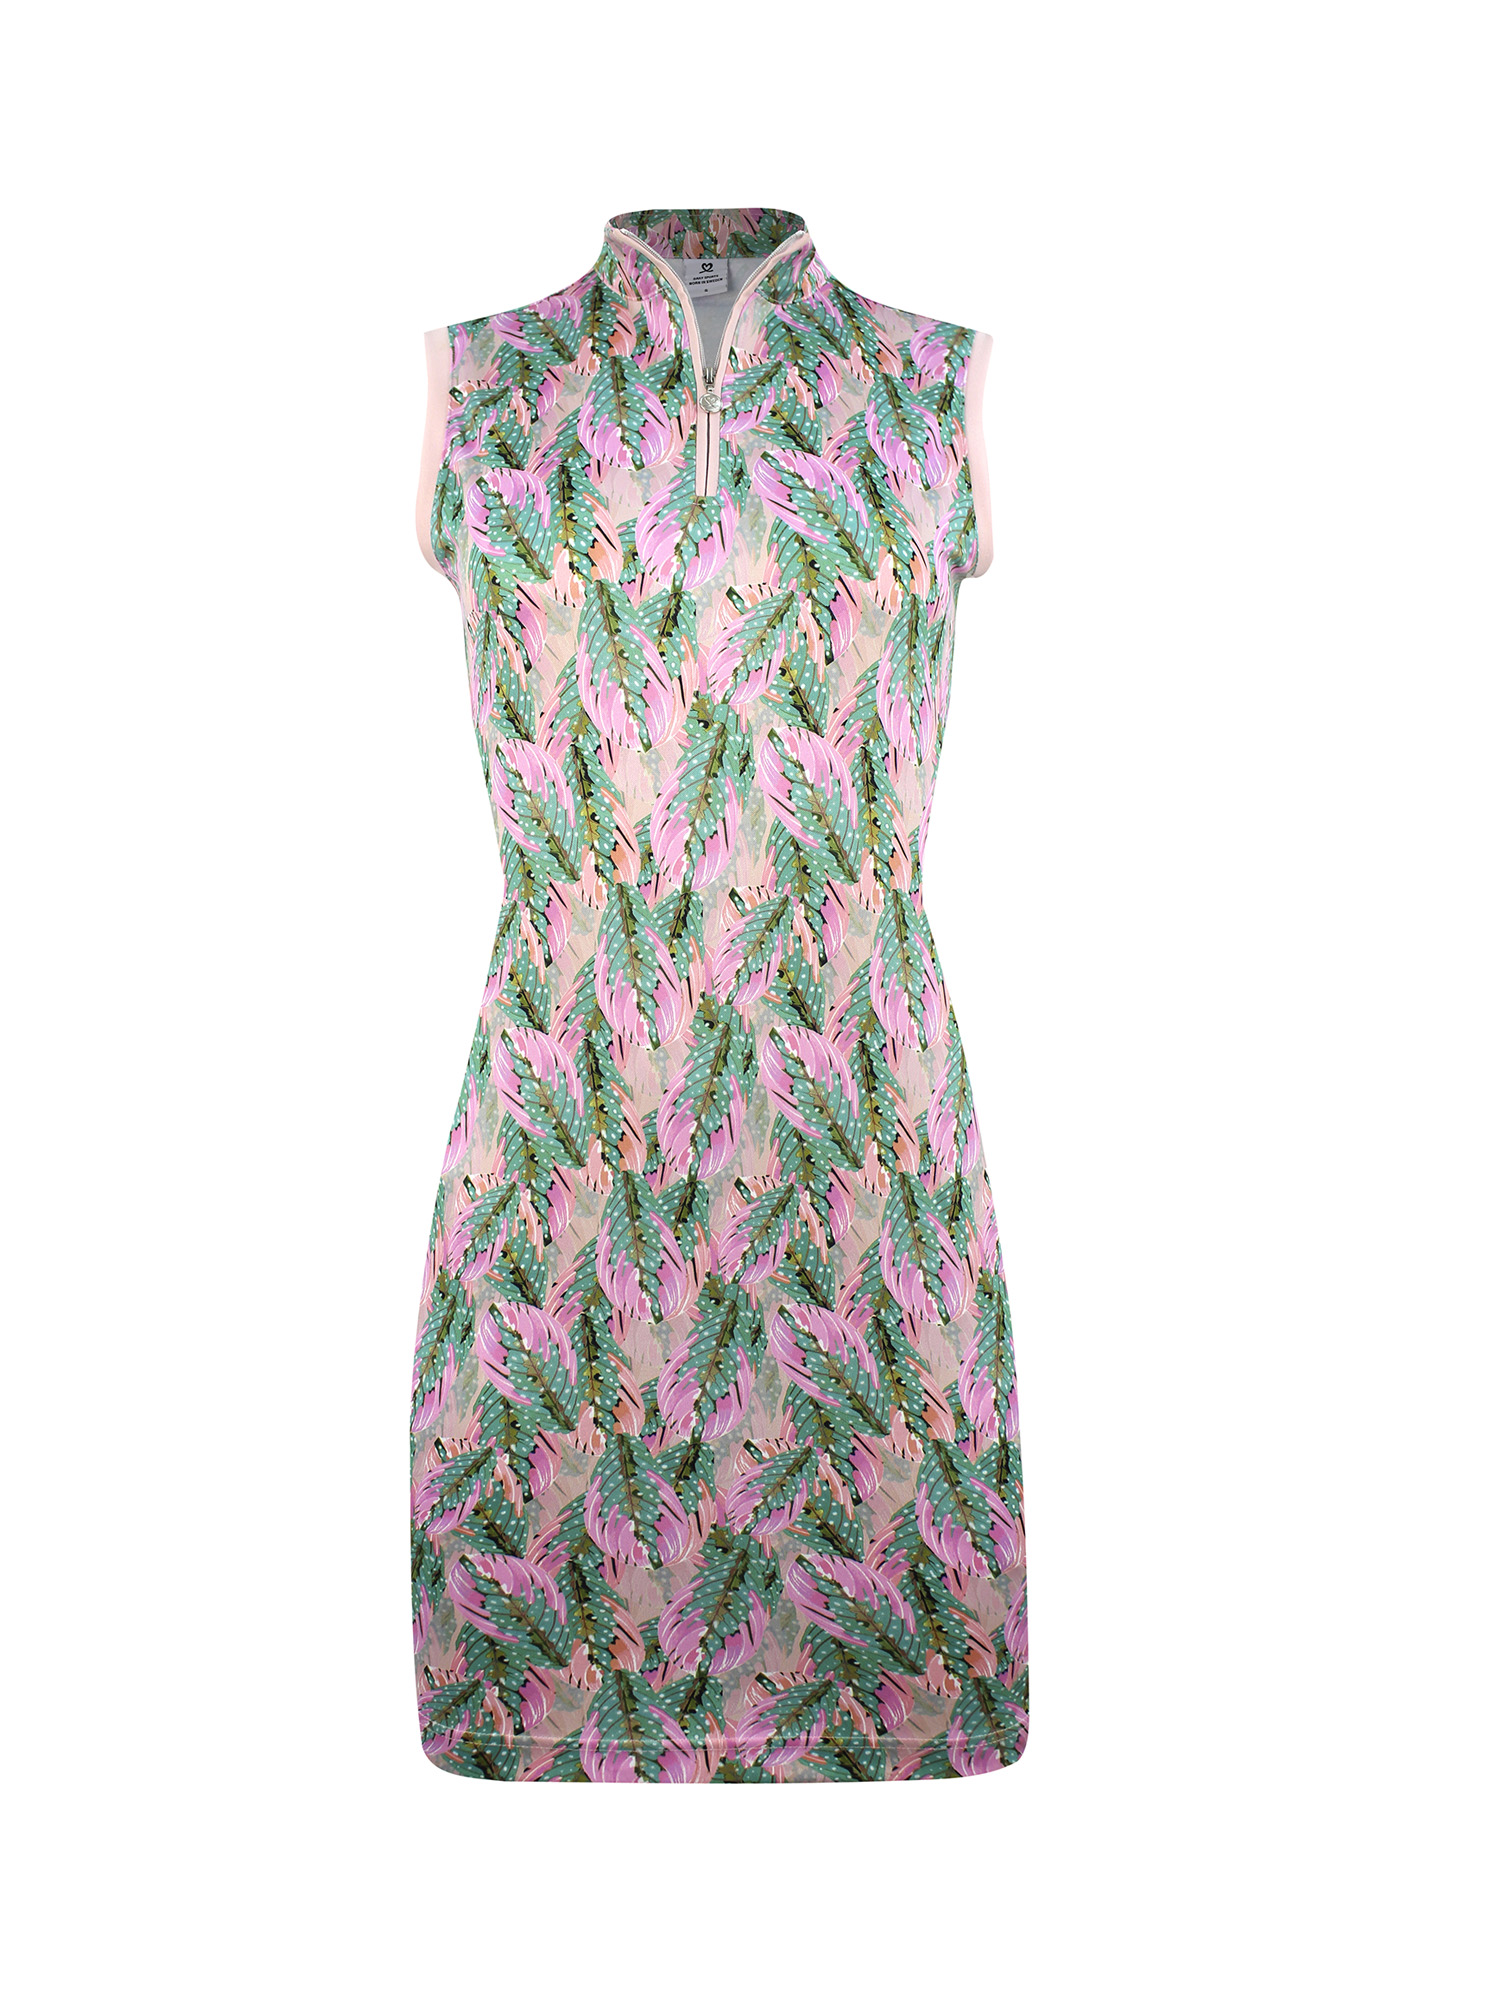 Ebba sleeveless dress